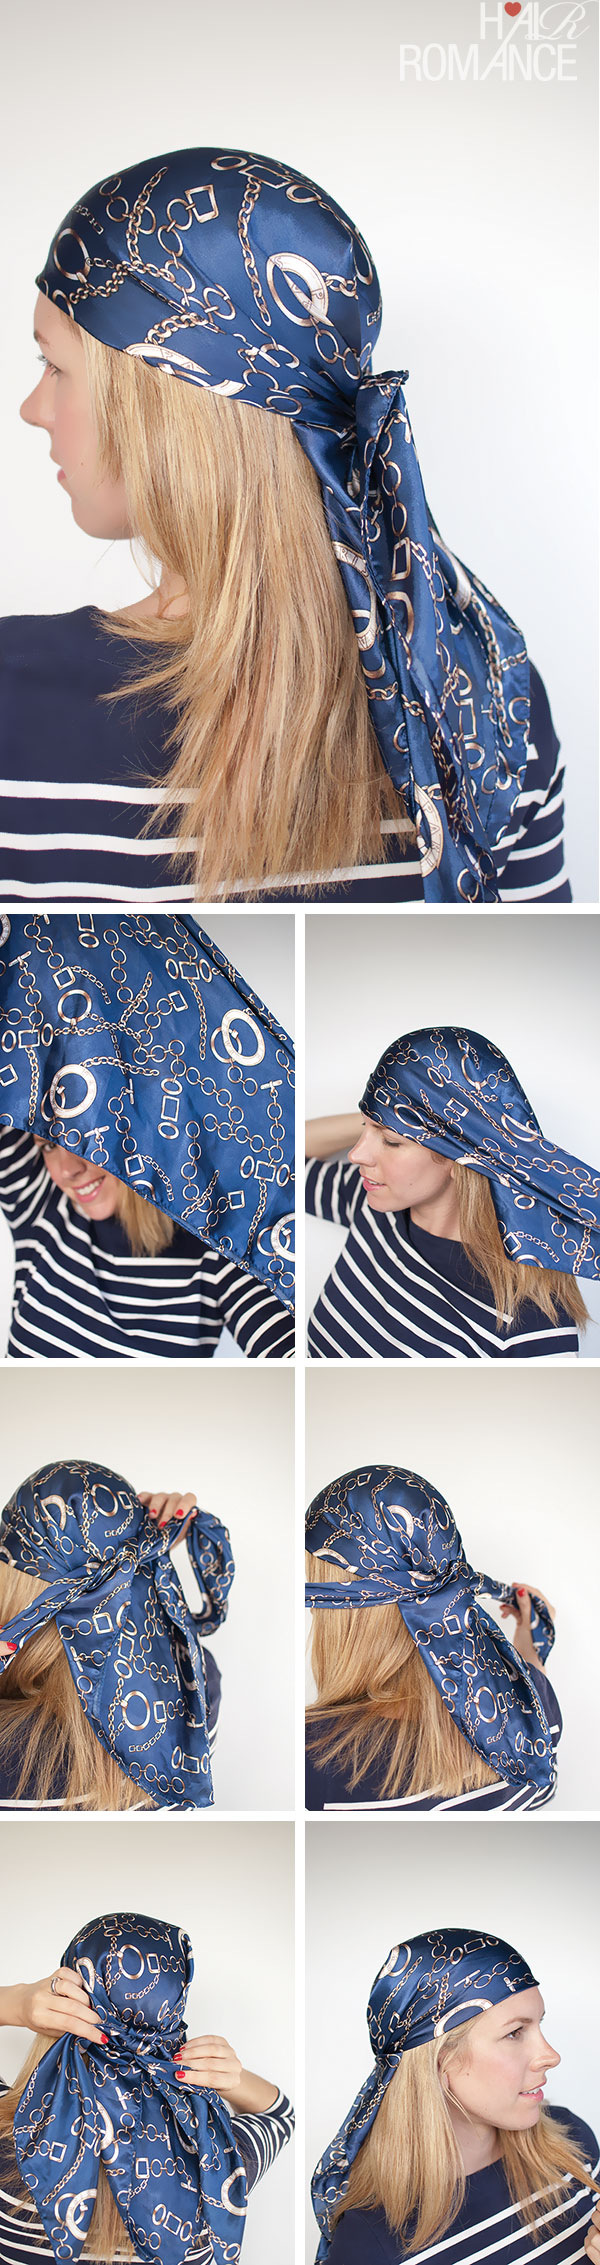 Hair Romance - Headscarf three ways - aye aye captain